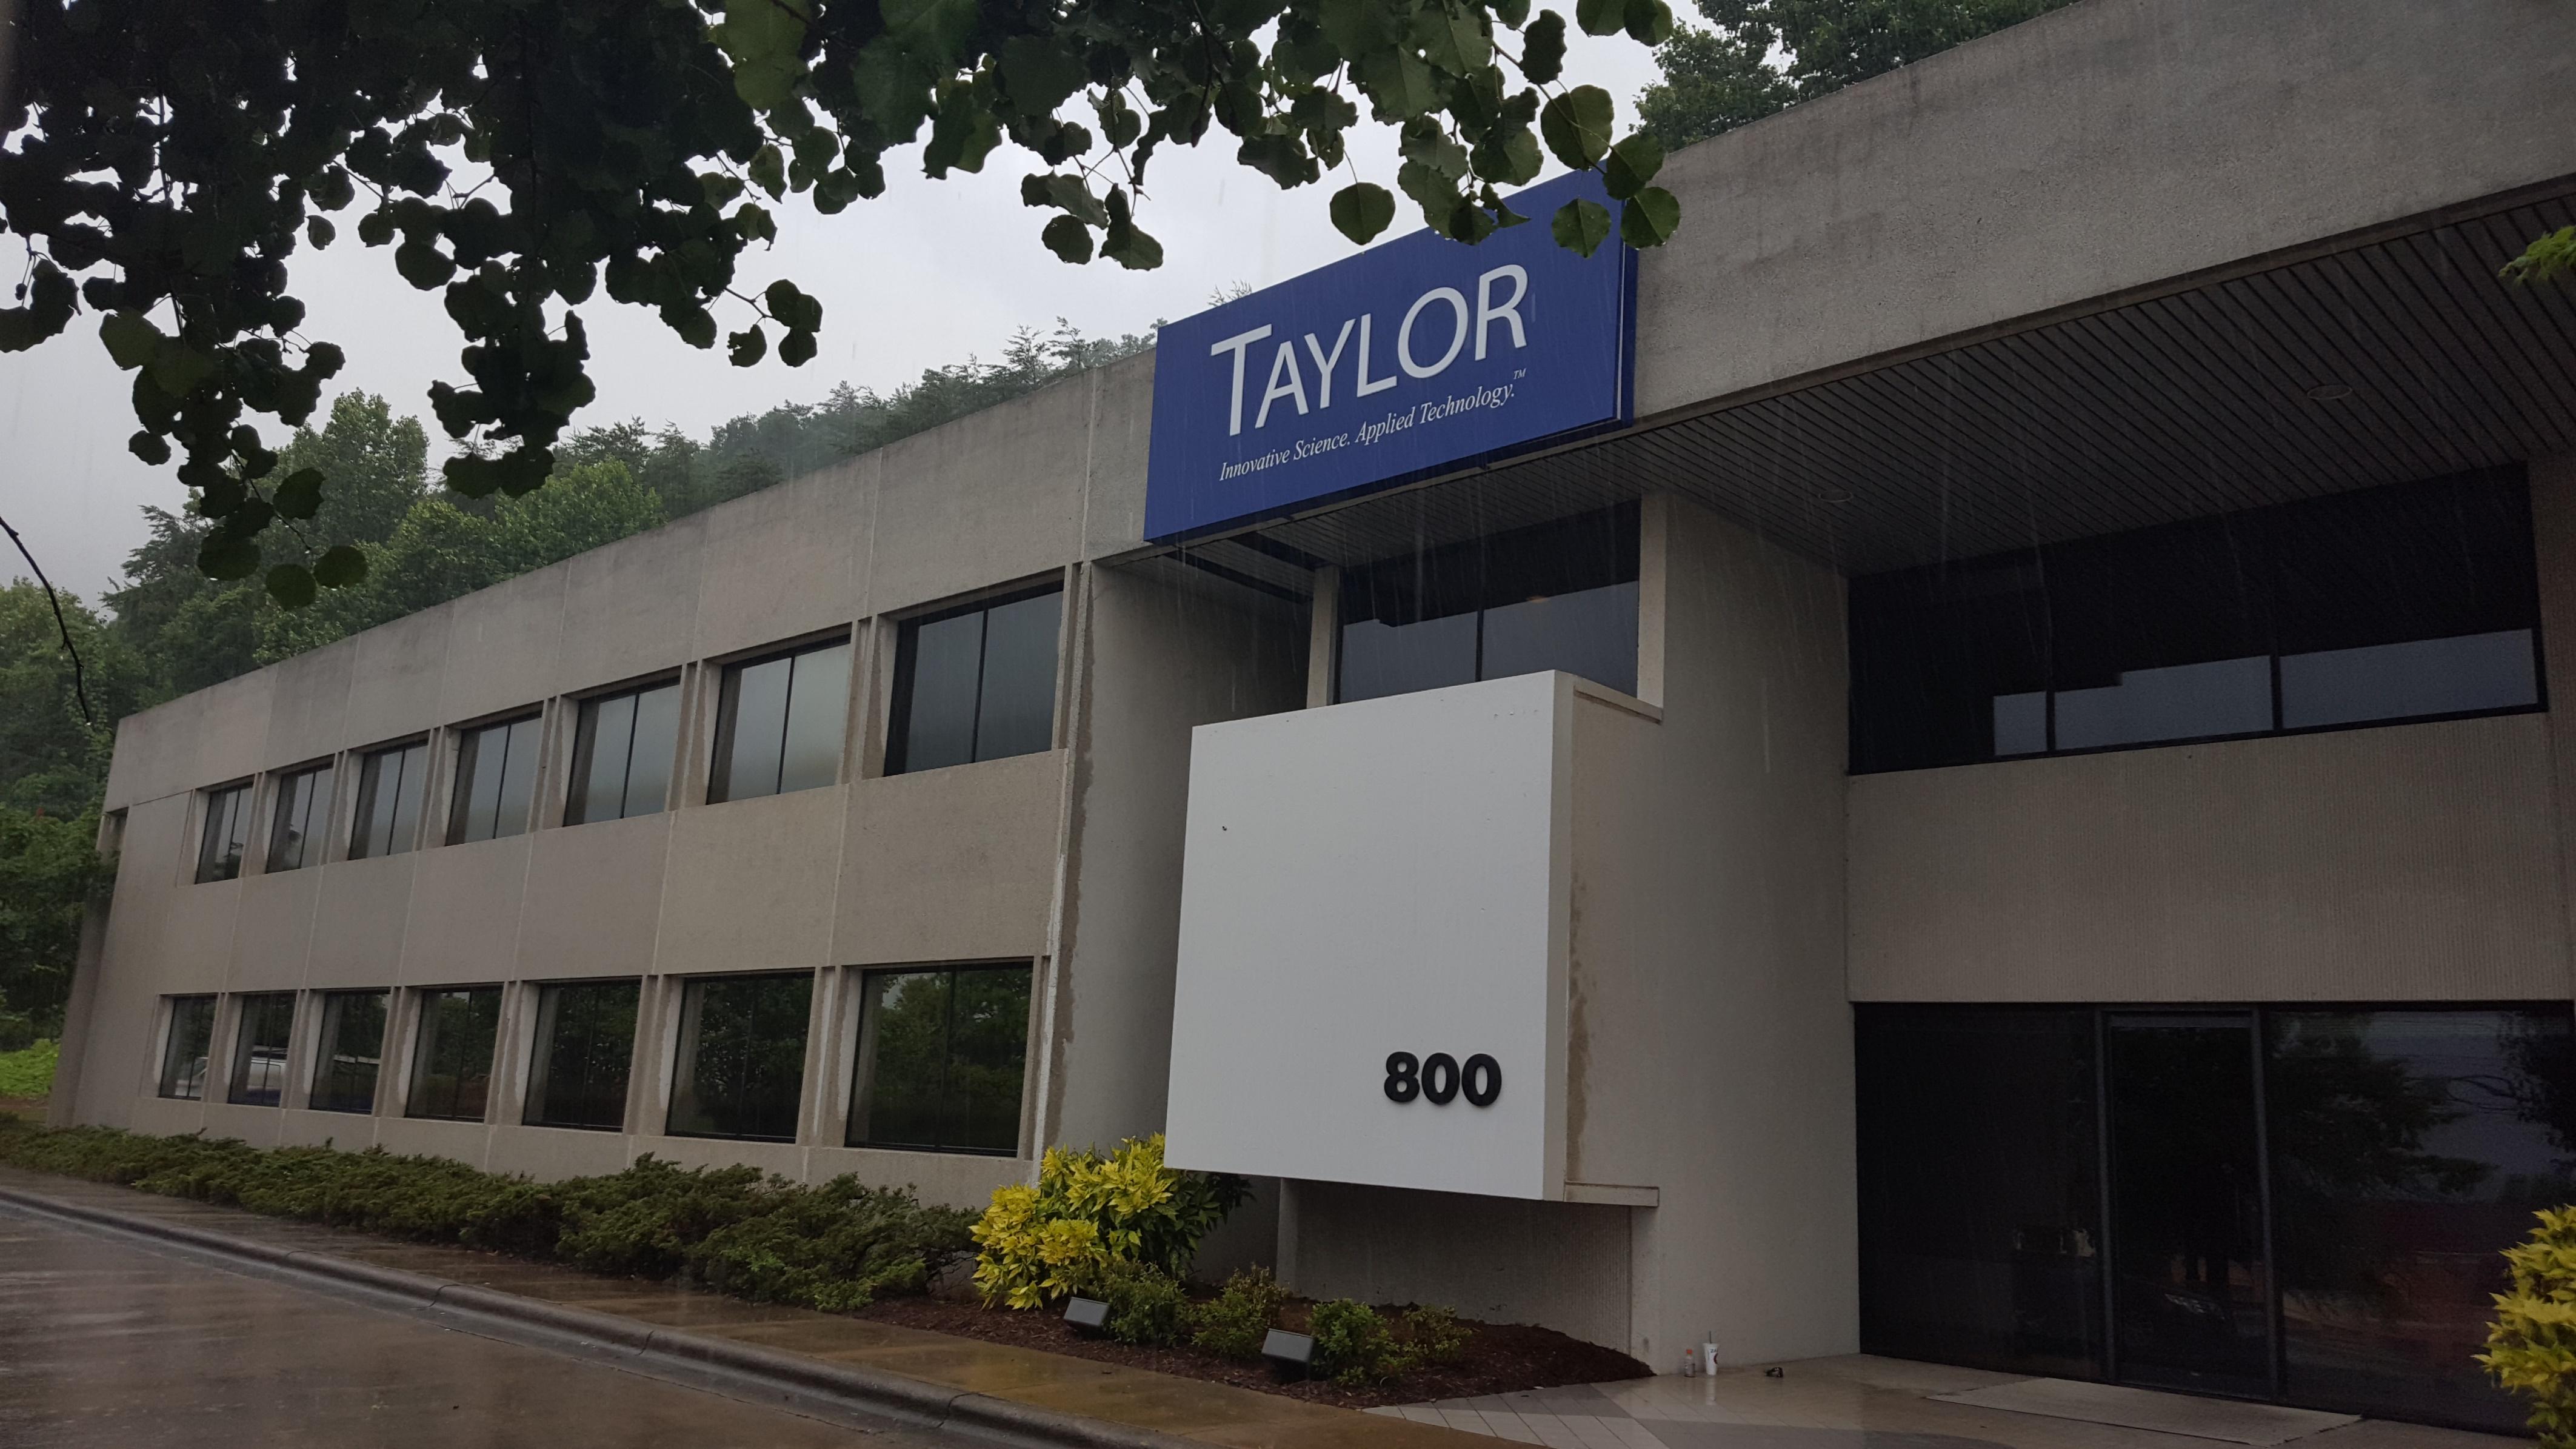 Taylor announces relocation of corporate headquarters to dalton